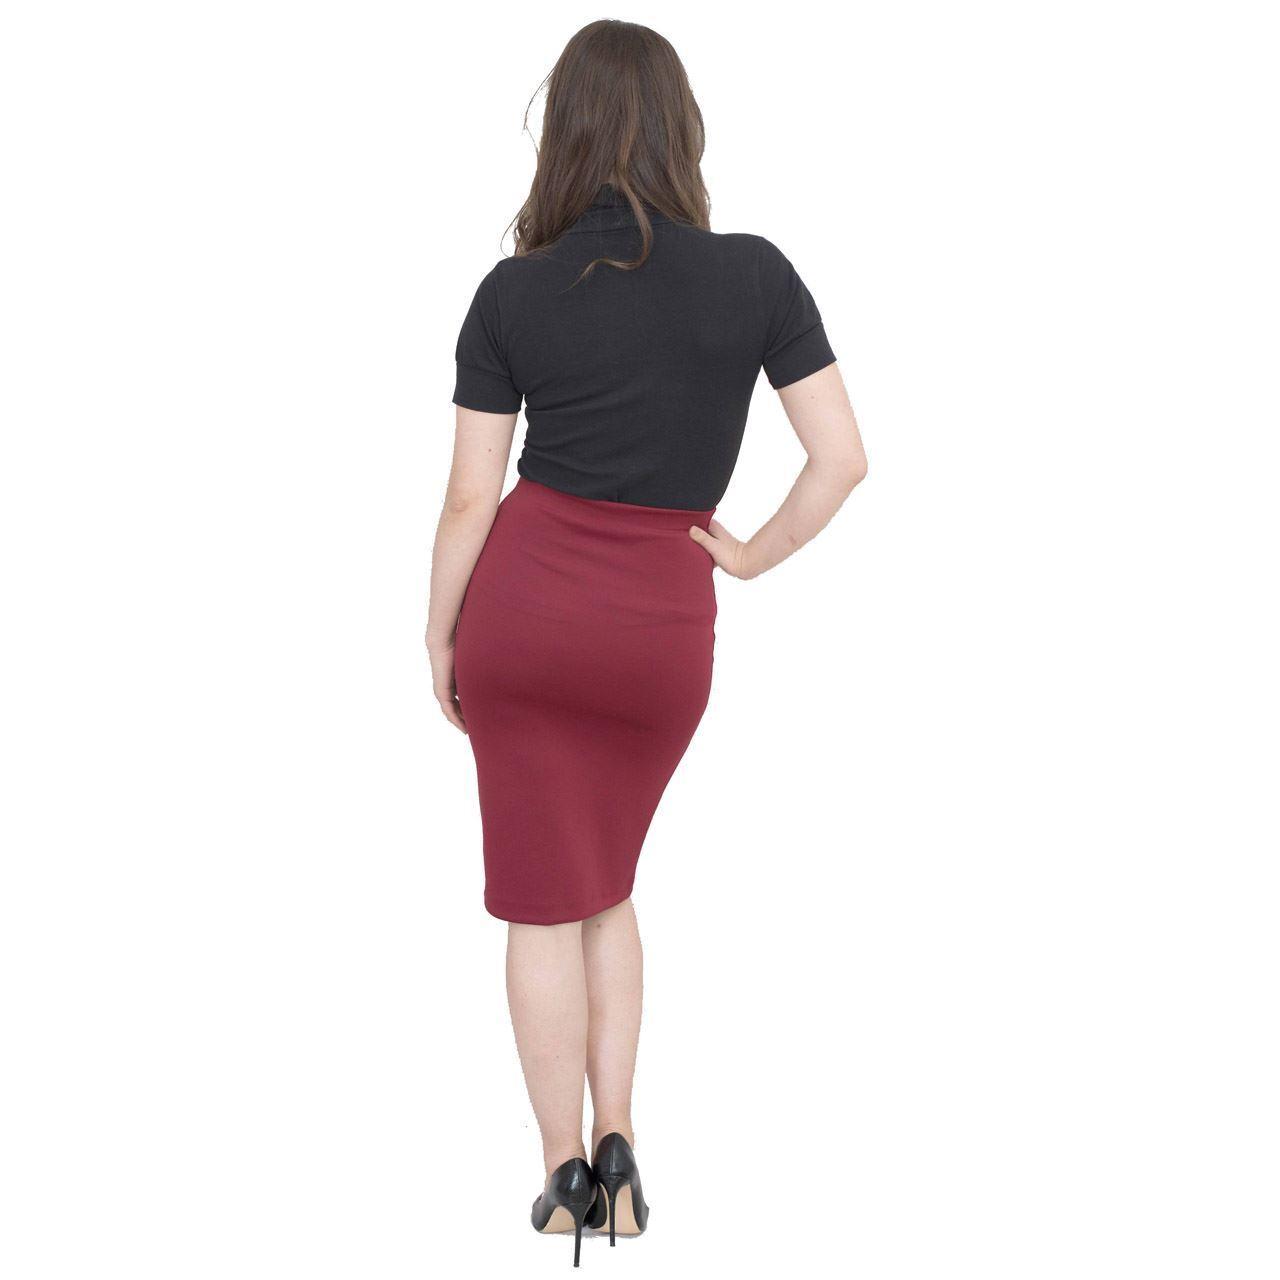 Jolie Max Women Pencil Skirt Midi Stretch Bodycon Skirt 8-20 Casual Officewear